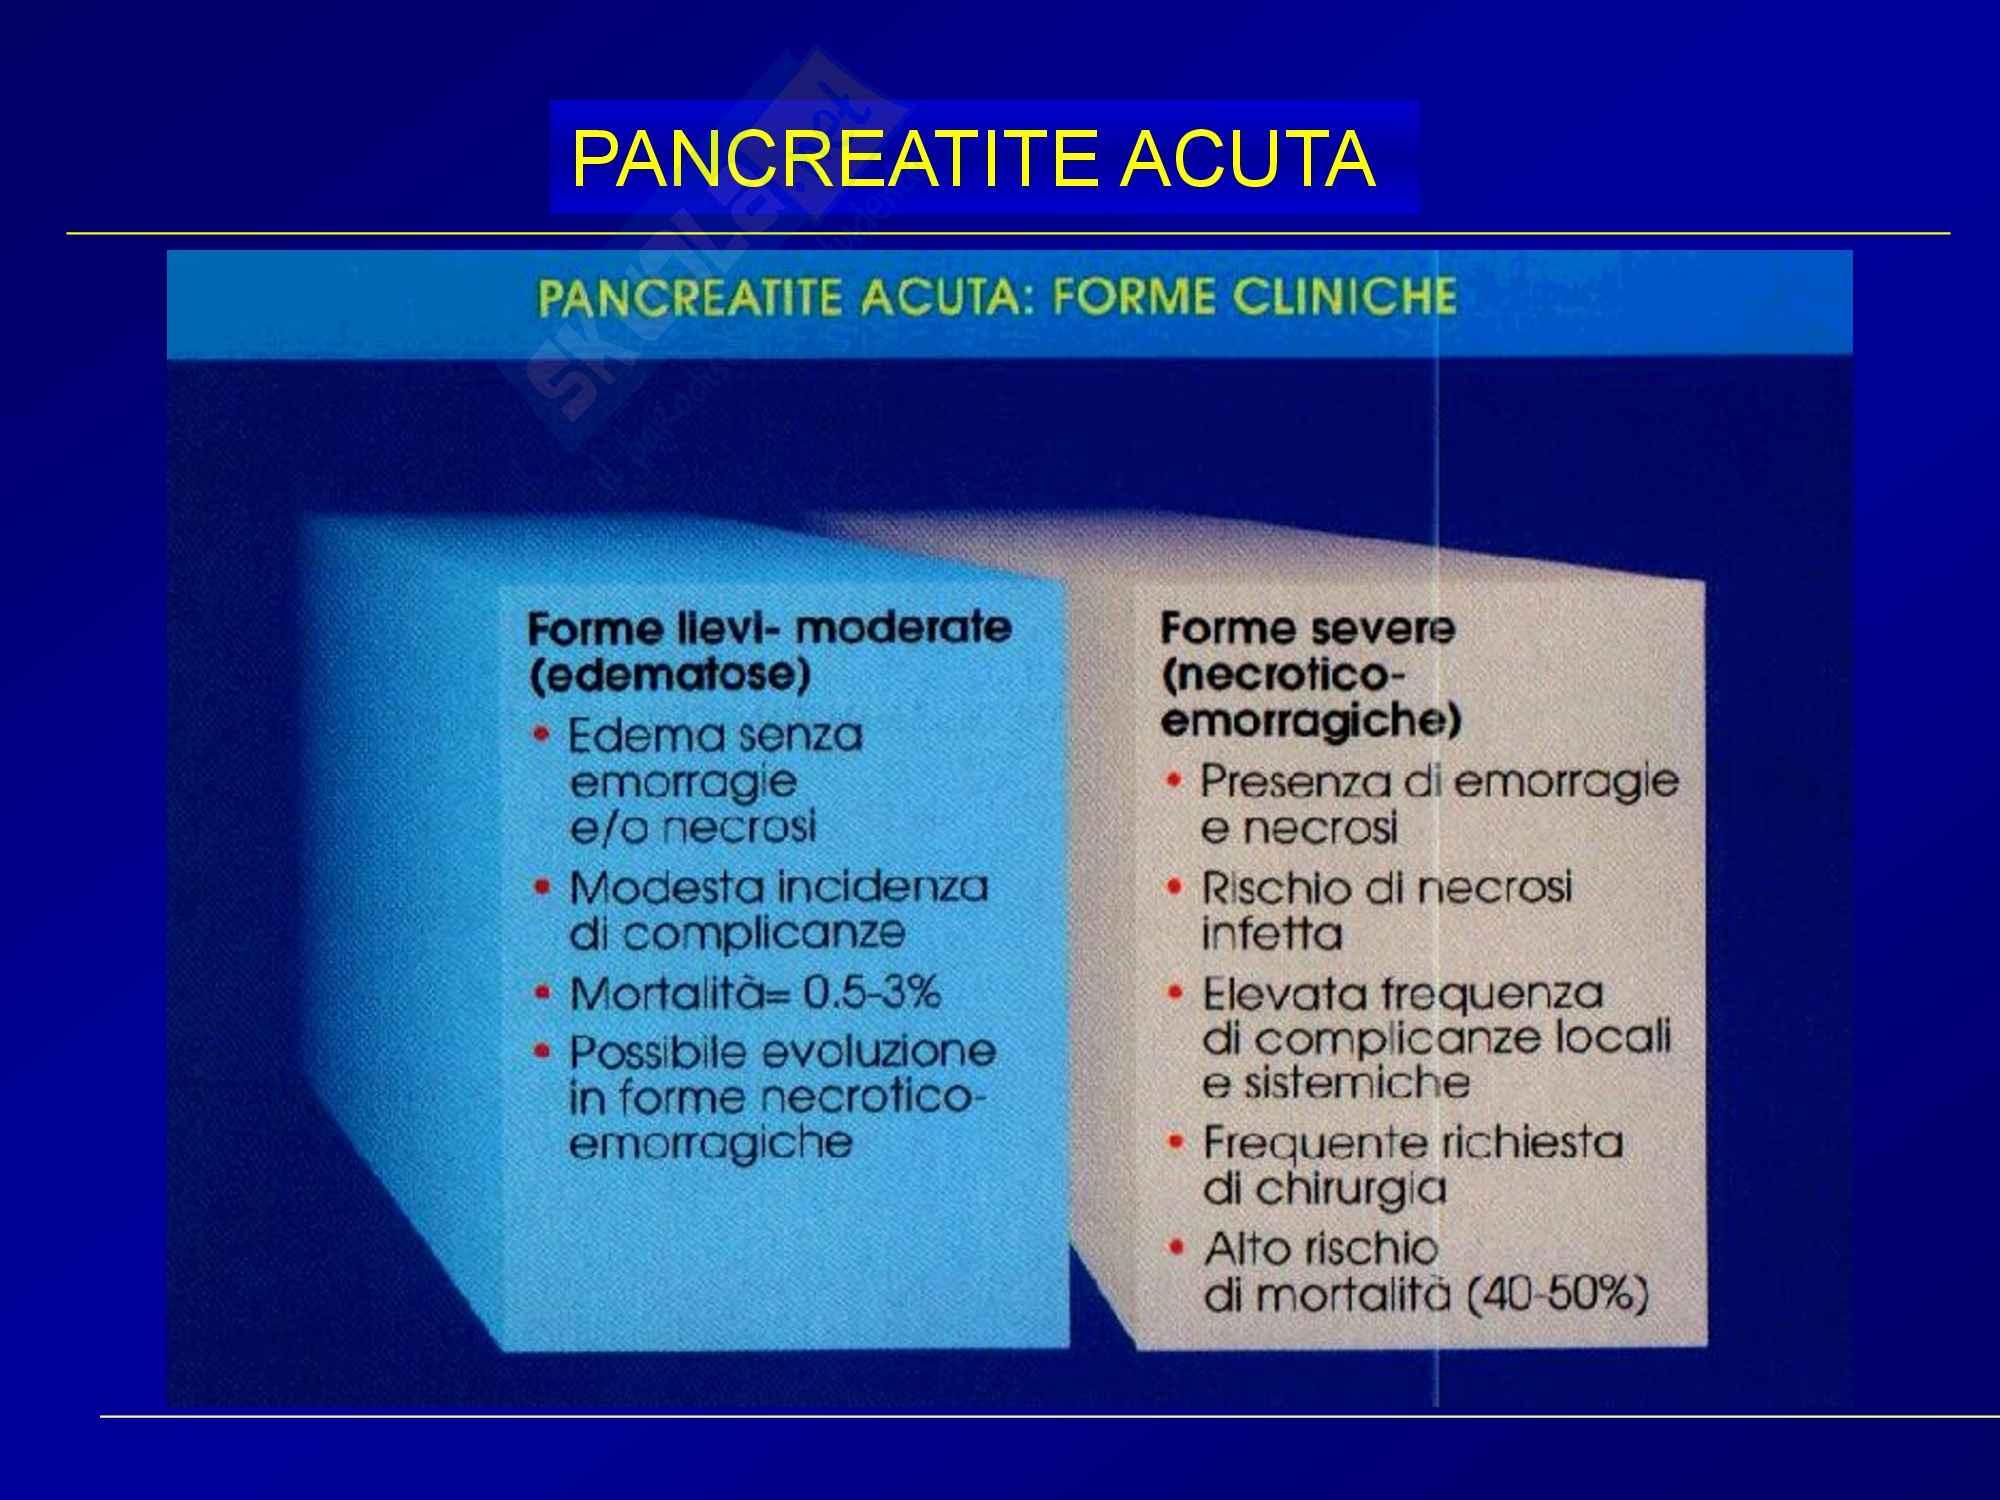 Chirurgia generale - pancreatite acuta Pag. 11